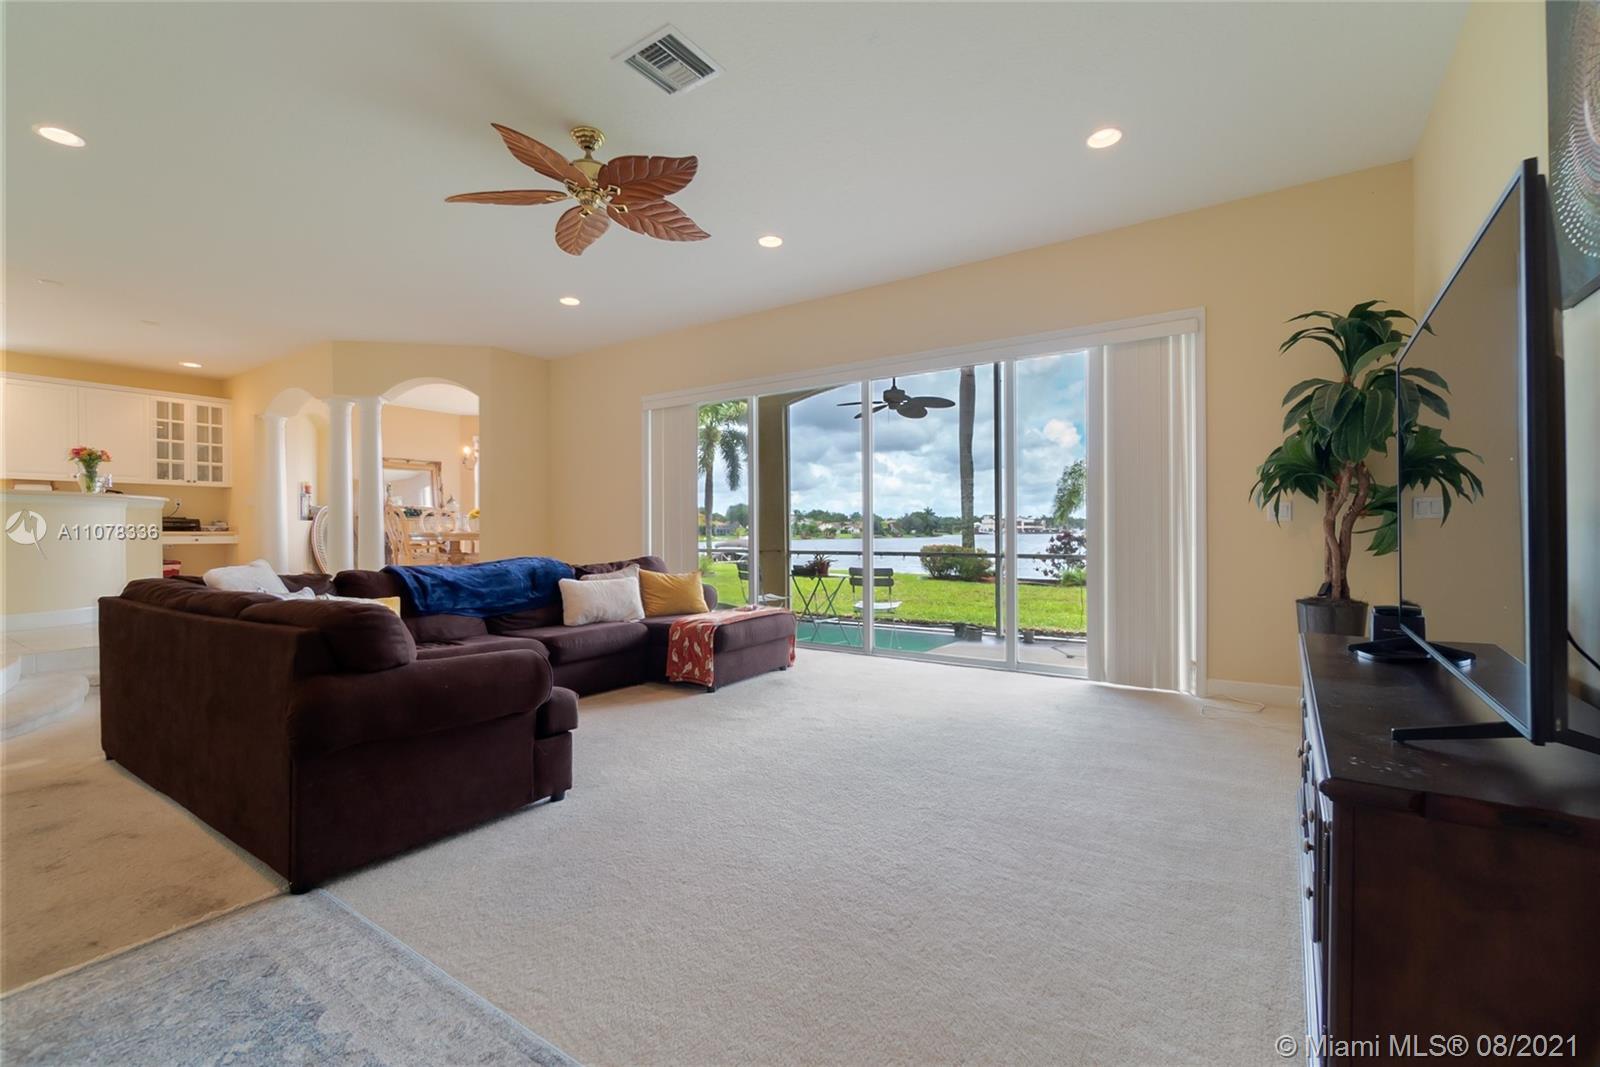 Photo of 12490 Shoreline Dr, Home